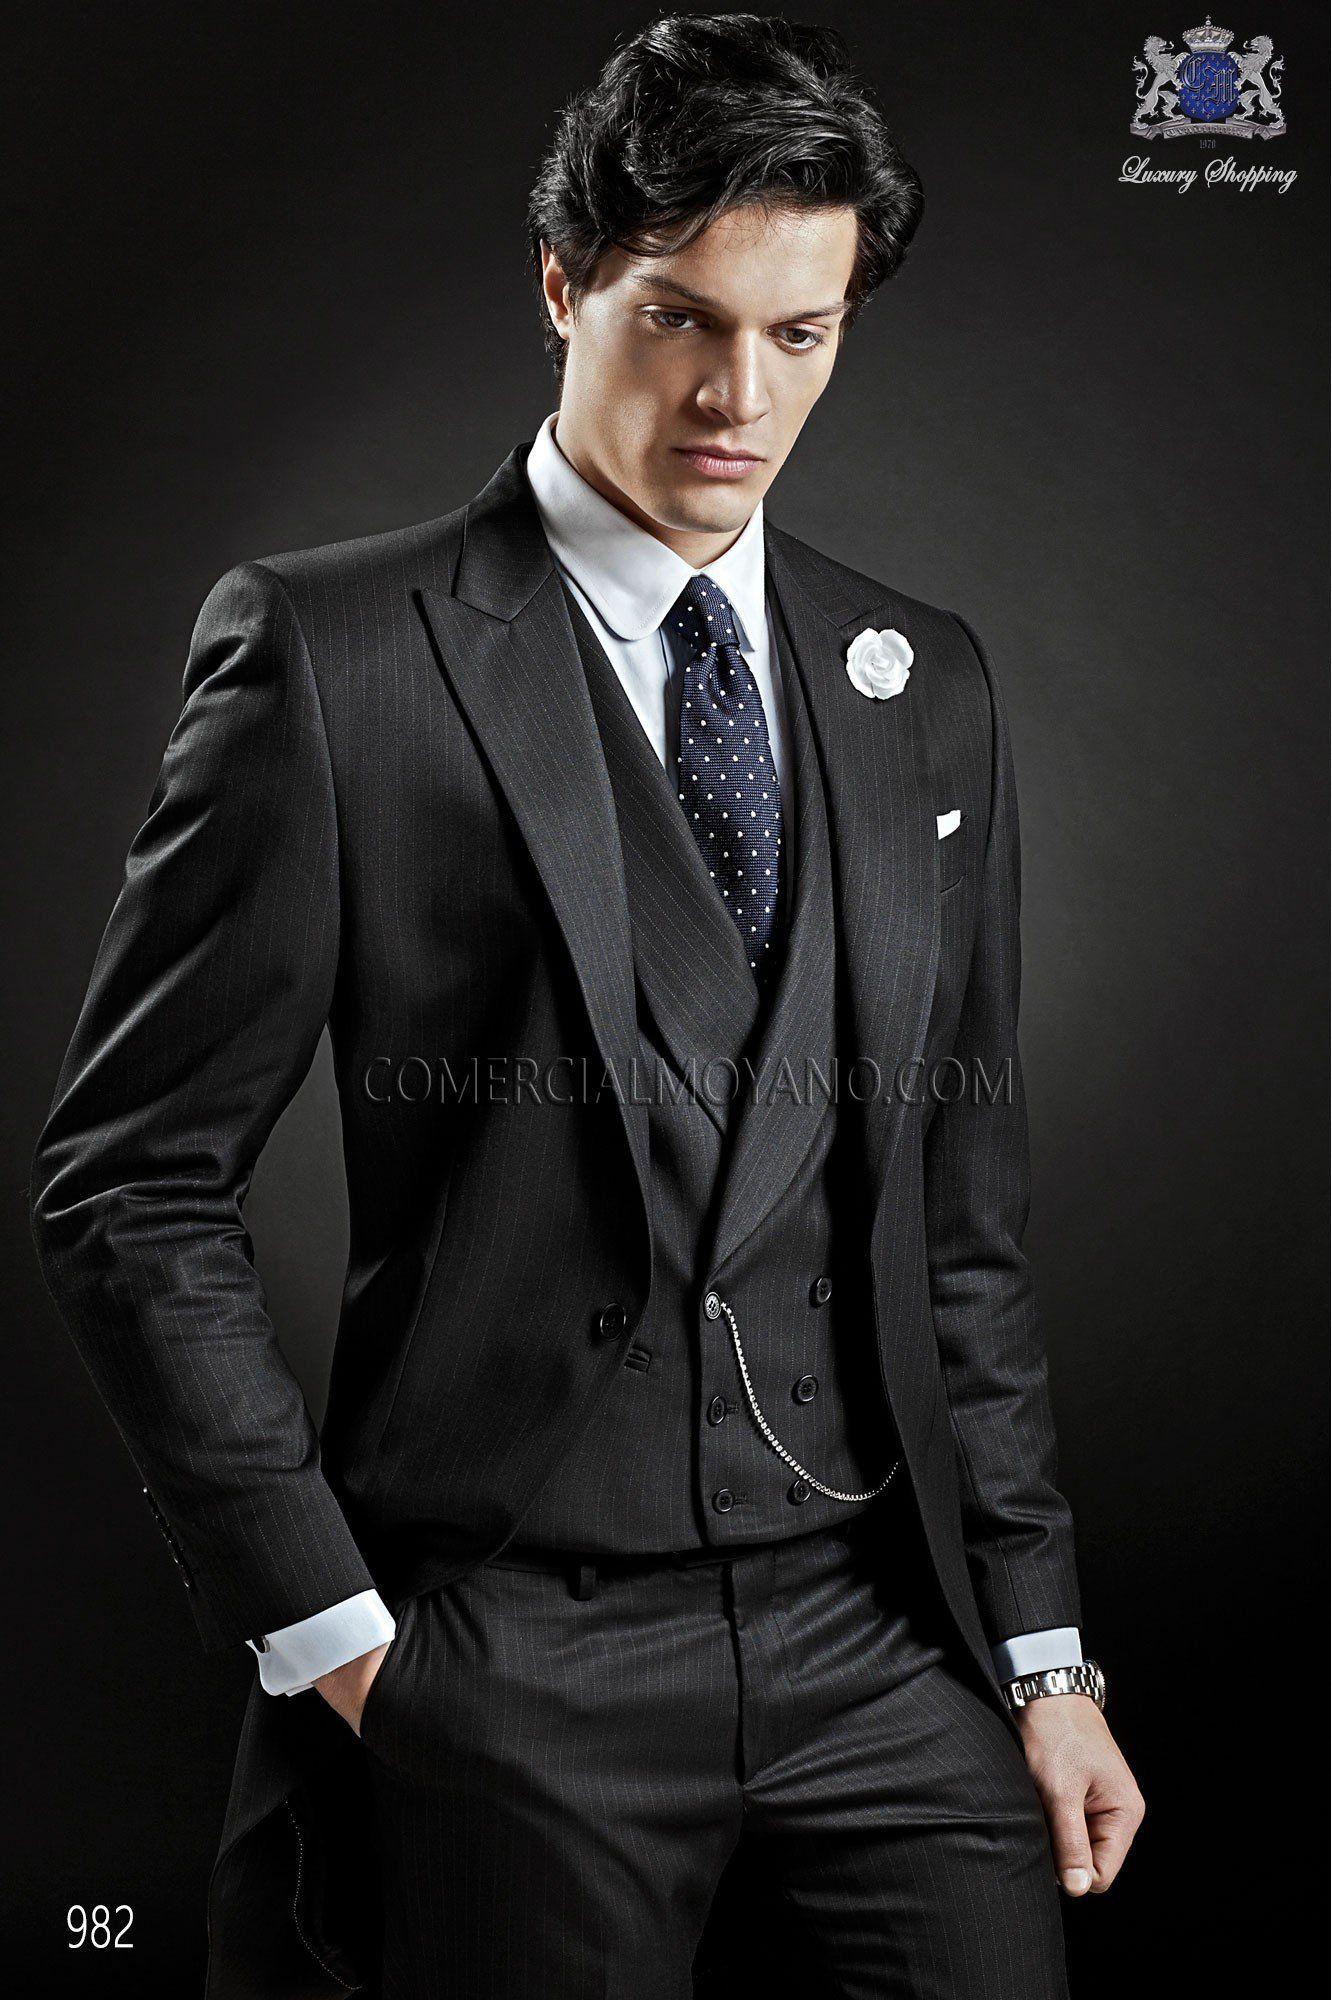 Italian bespoke wedding morning suit, in new performance black ...